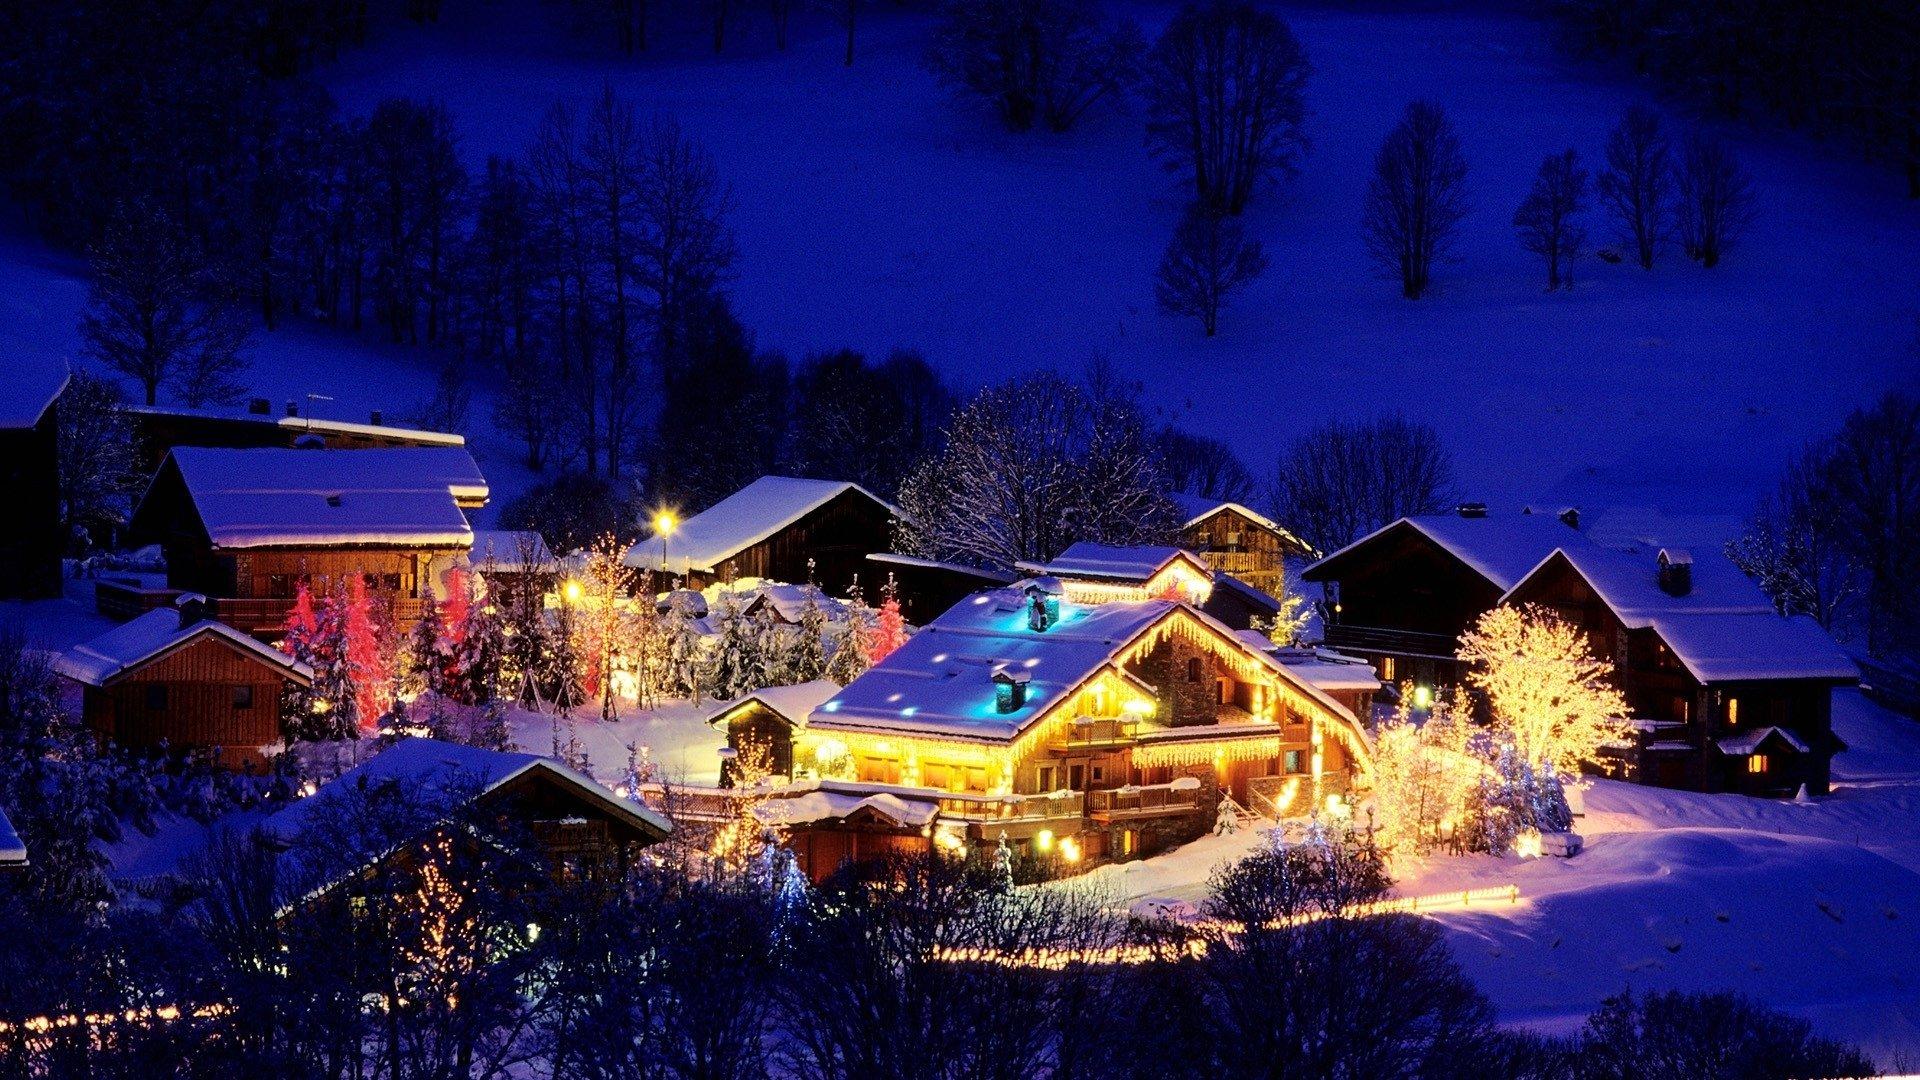 Christmas lights wallpapers 1920x1080 full hd 1080p - Hd christmas wallpapers 1080p ...